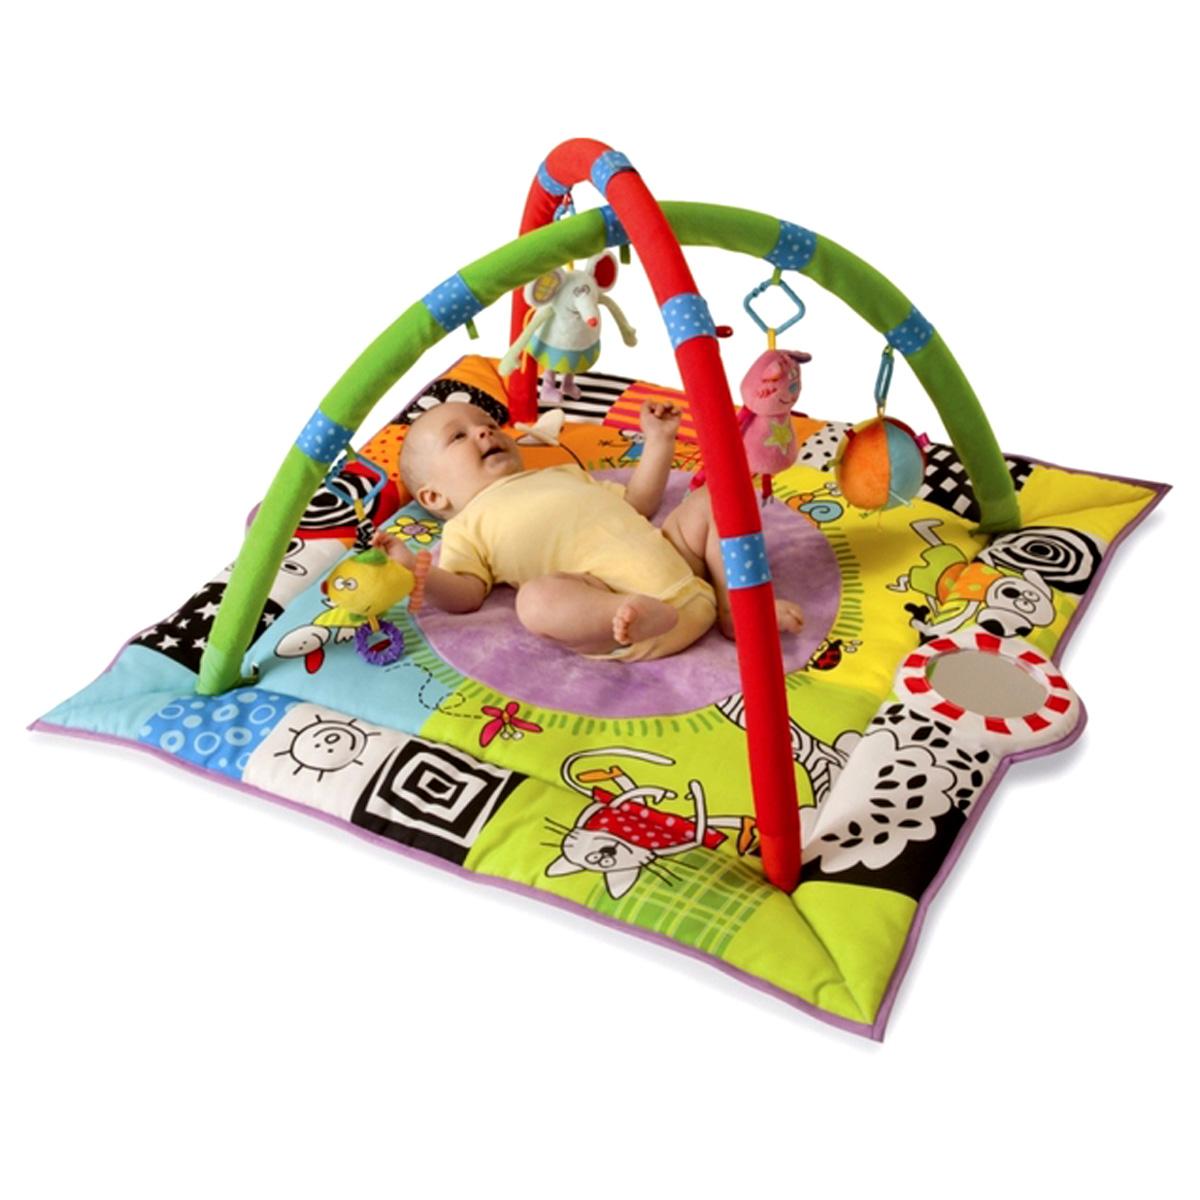 ����������� ������ Taf Toys � ������ (90*90 ��.)